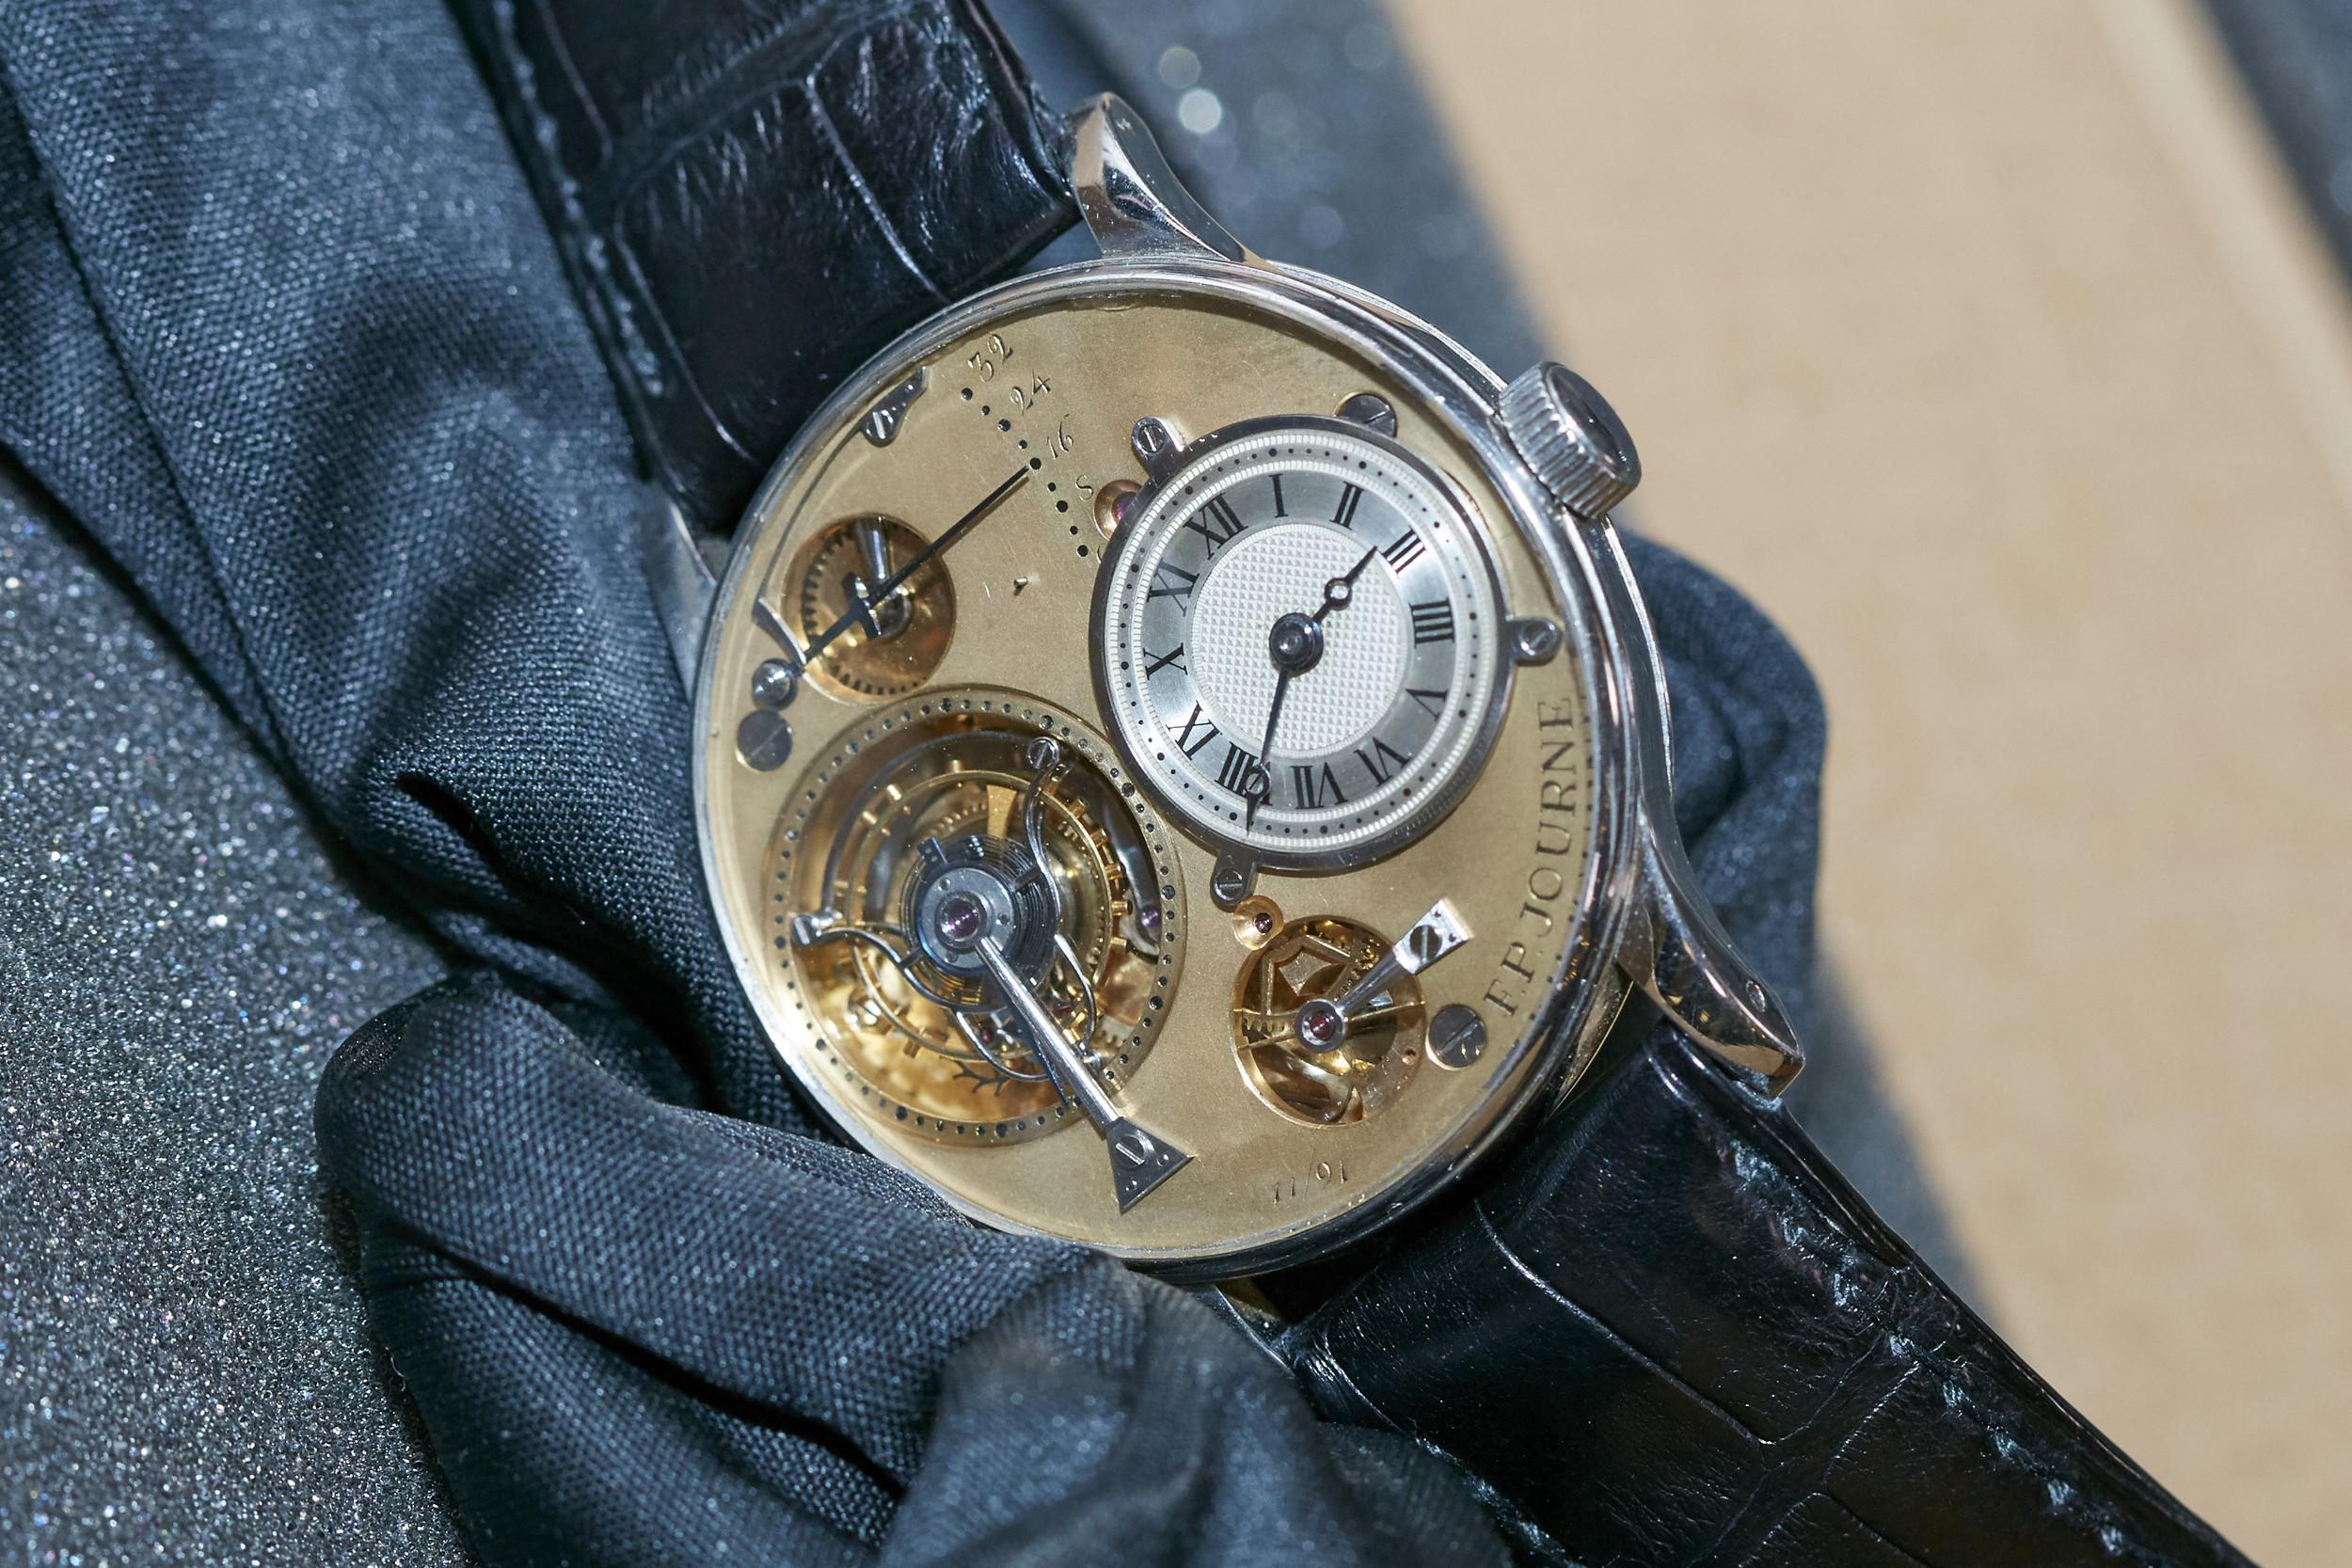 François-Paul Journe's First Wristwatch